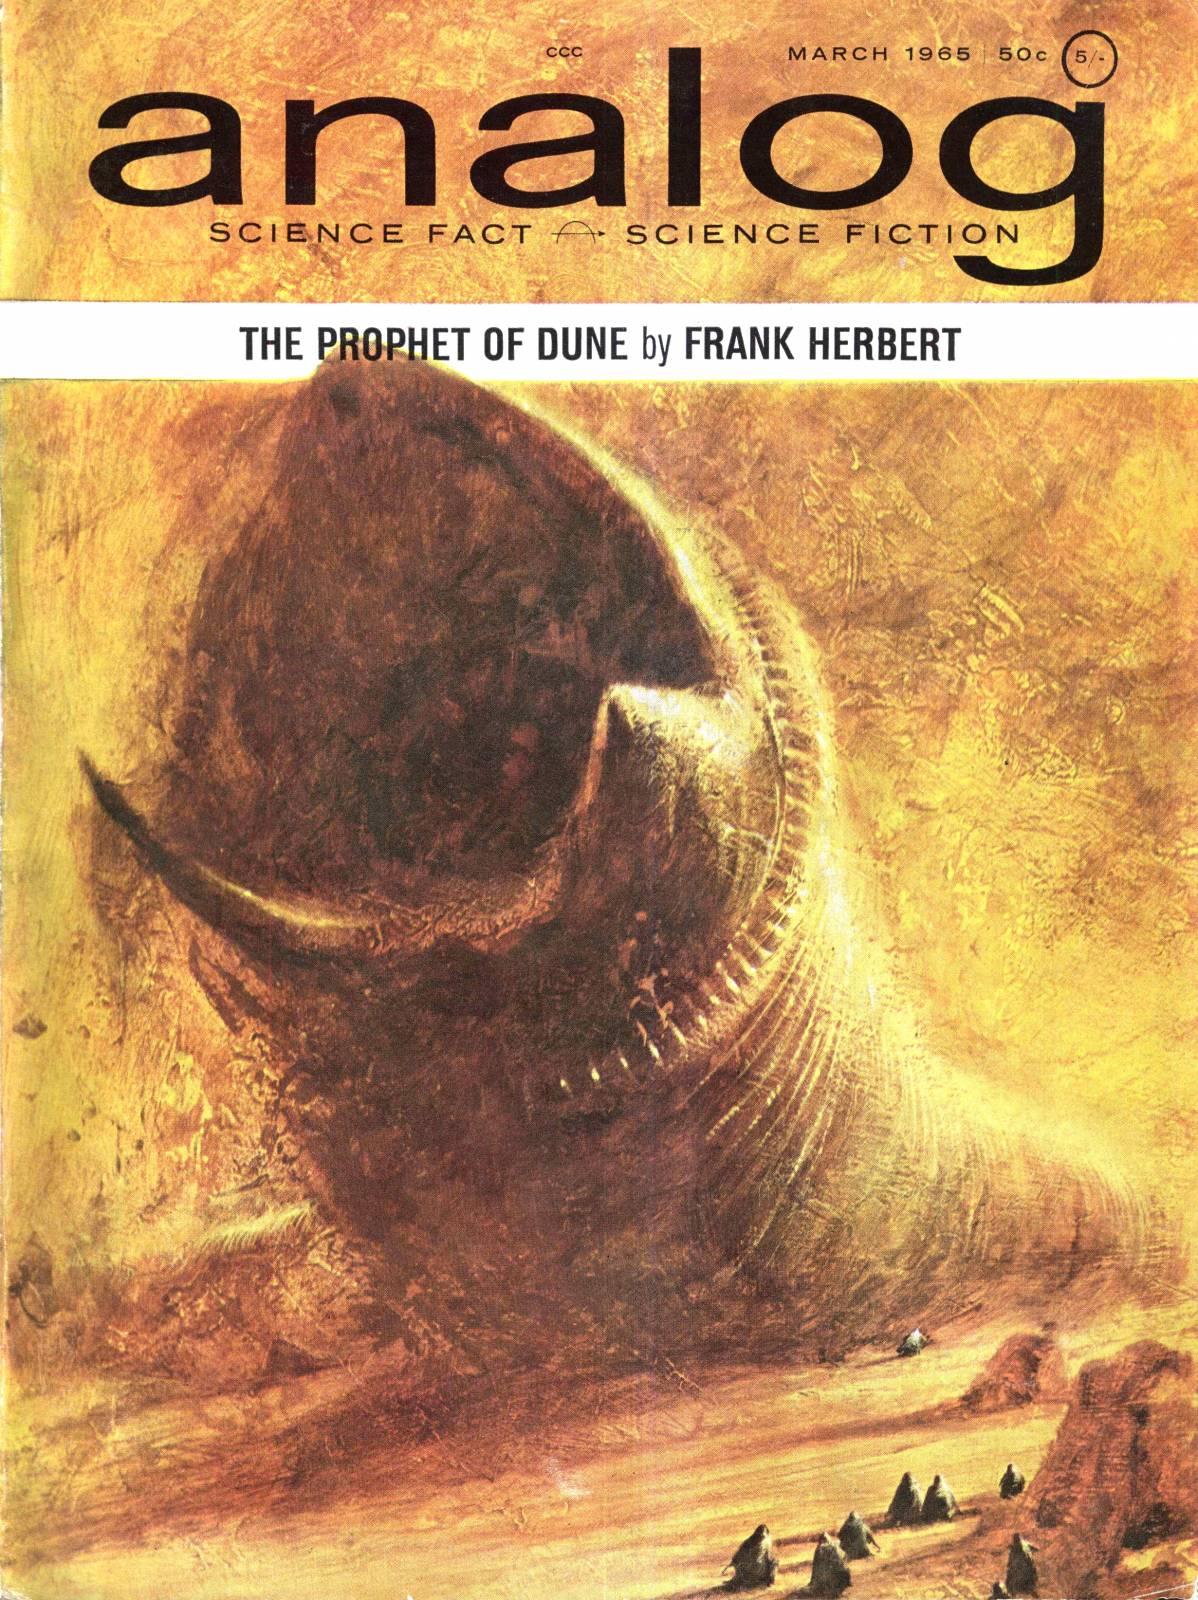 dune-John Schoenherr-Analog-mar1965